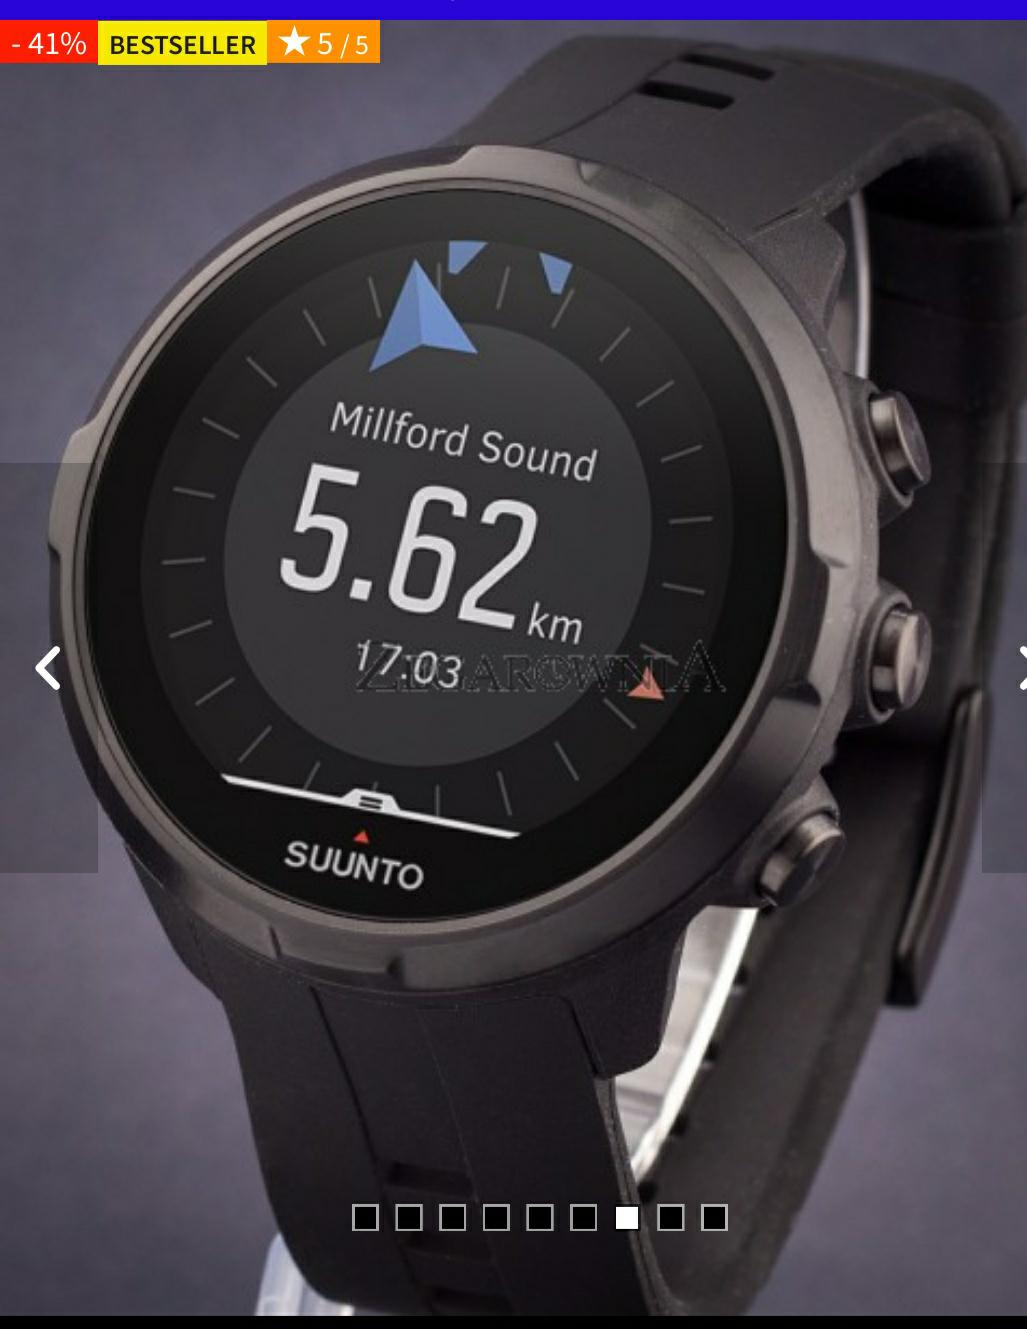 Zegarek Suunto Spartan Sport Wrist HR All Black